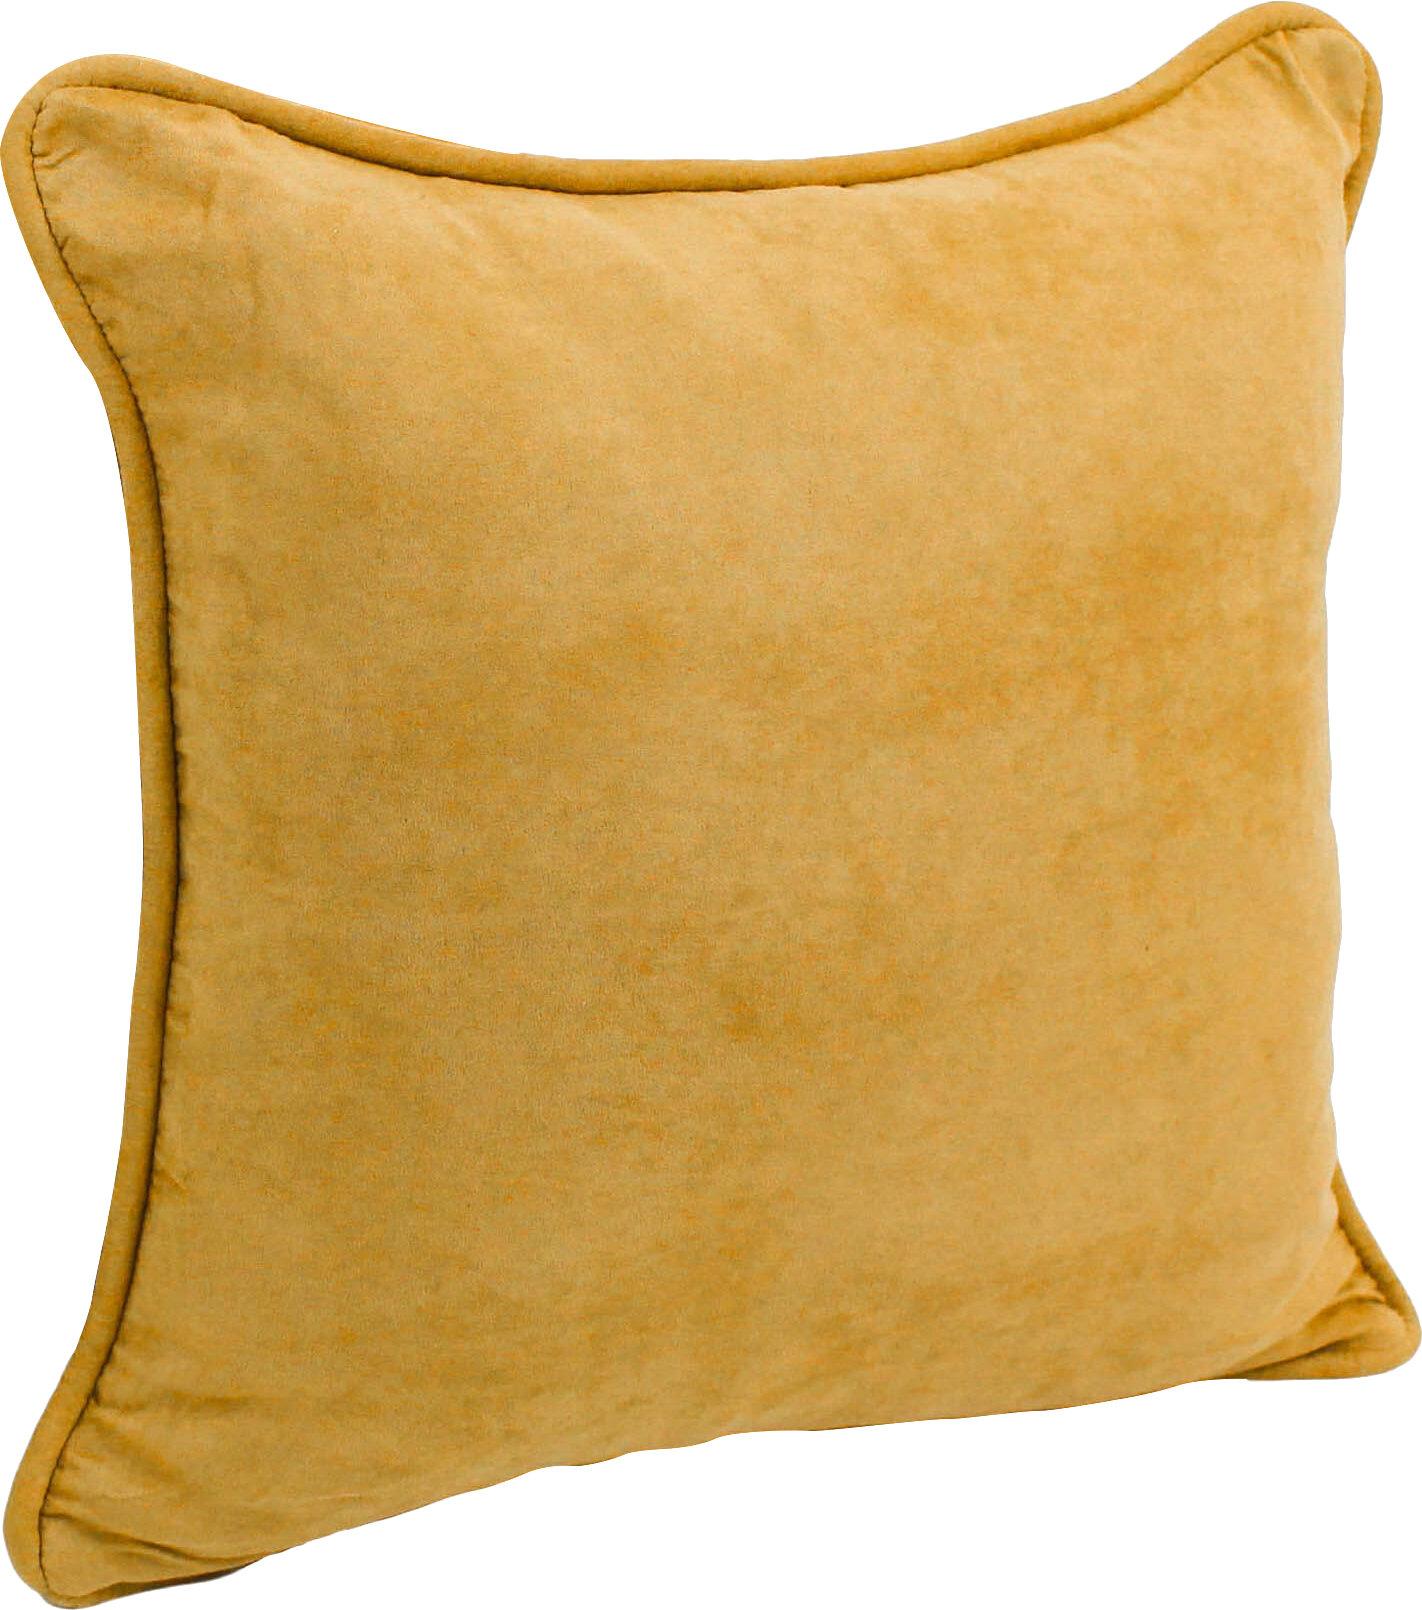 dsc products pillow desicrafts silk lumbar lotus orange art cover purple